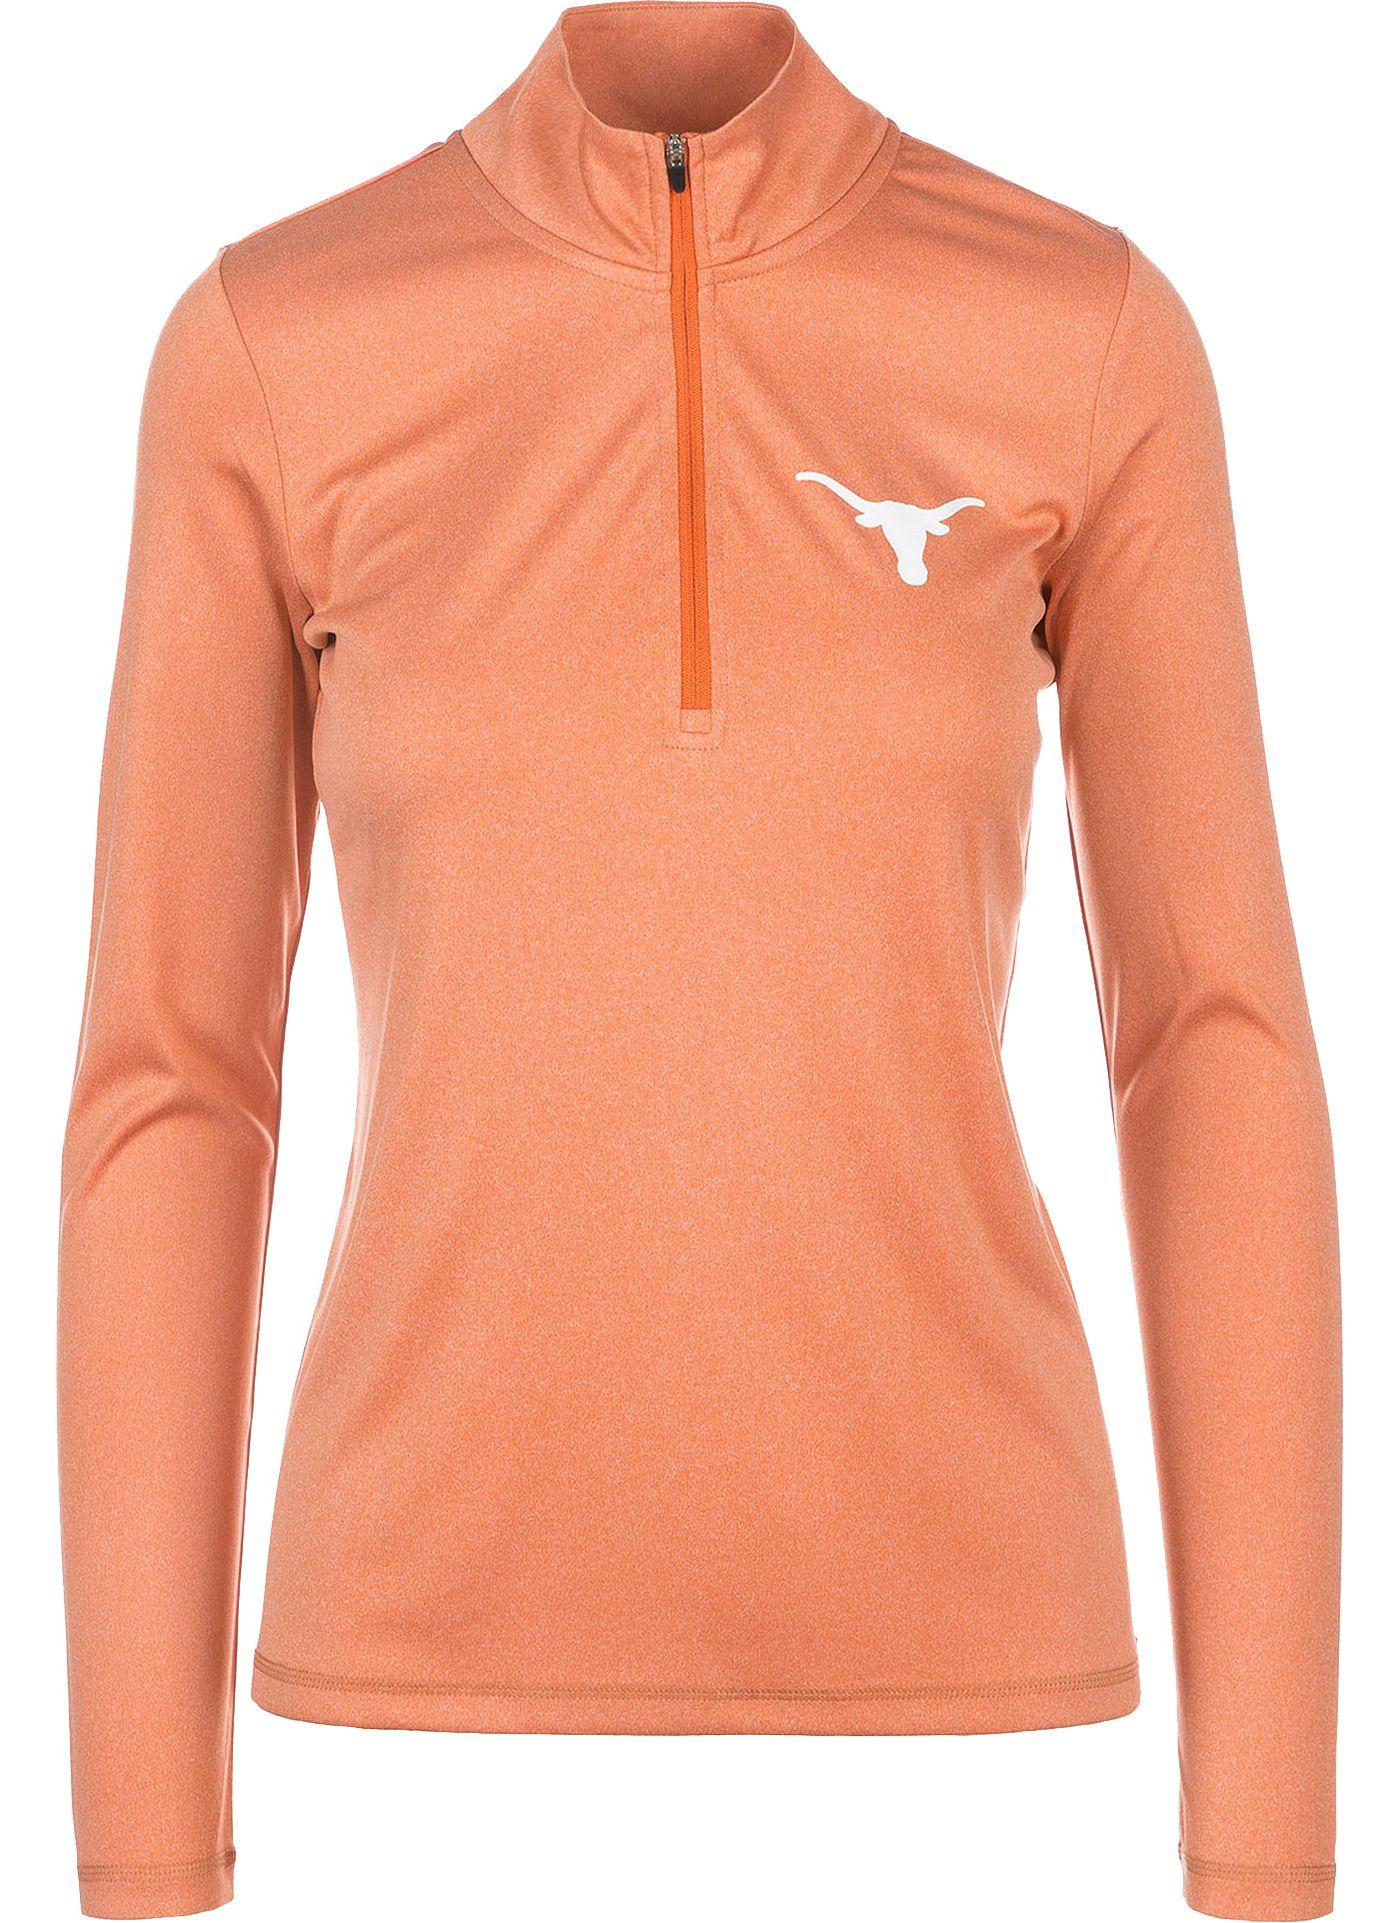 University of Texas Authentic Apparel Women's Texas Longhorns Burnt Orange Darcy Quarter-Zip Top